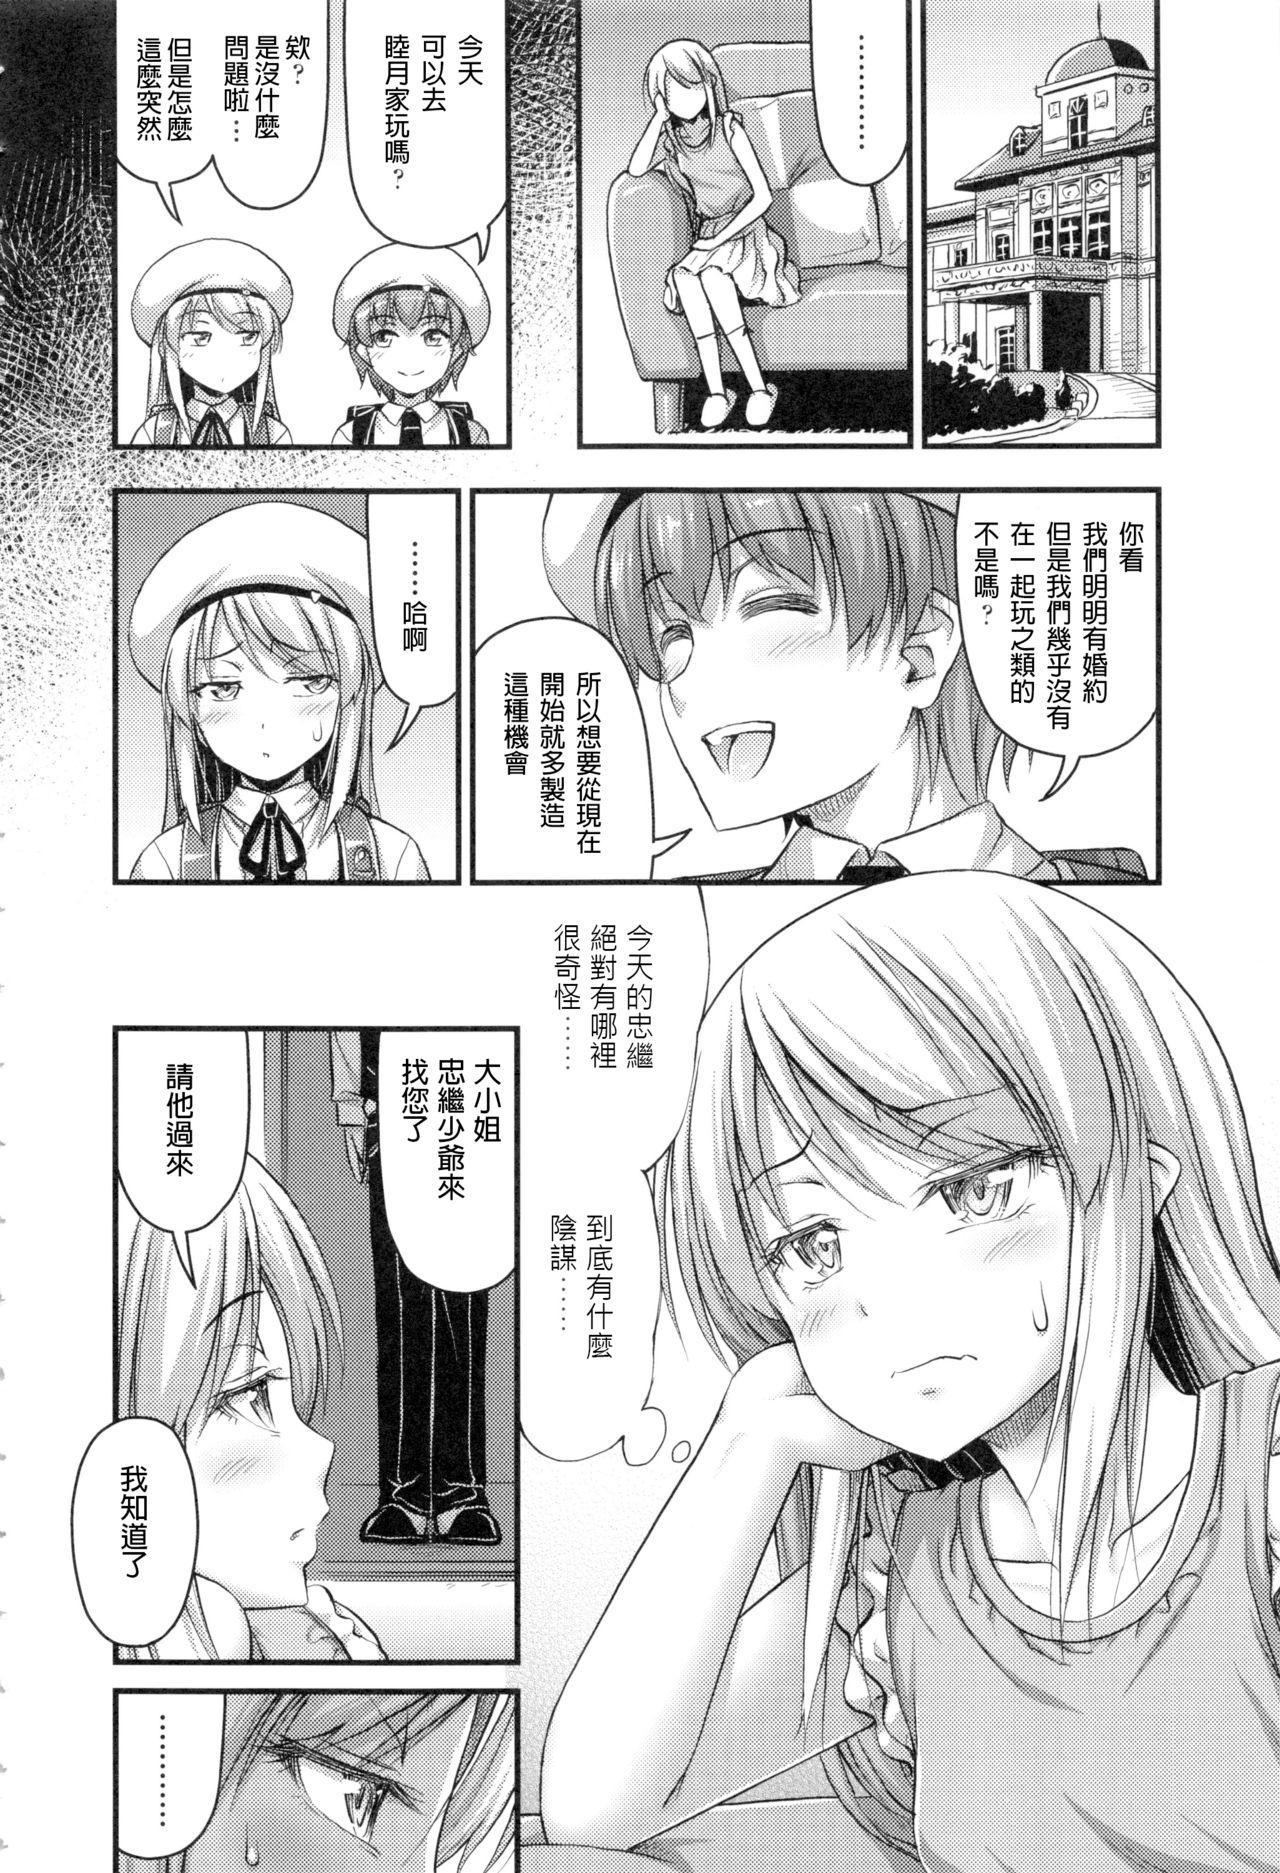 Onii-chan Sonna ni Short Pants Suki nano? 143